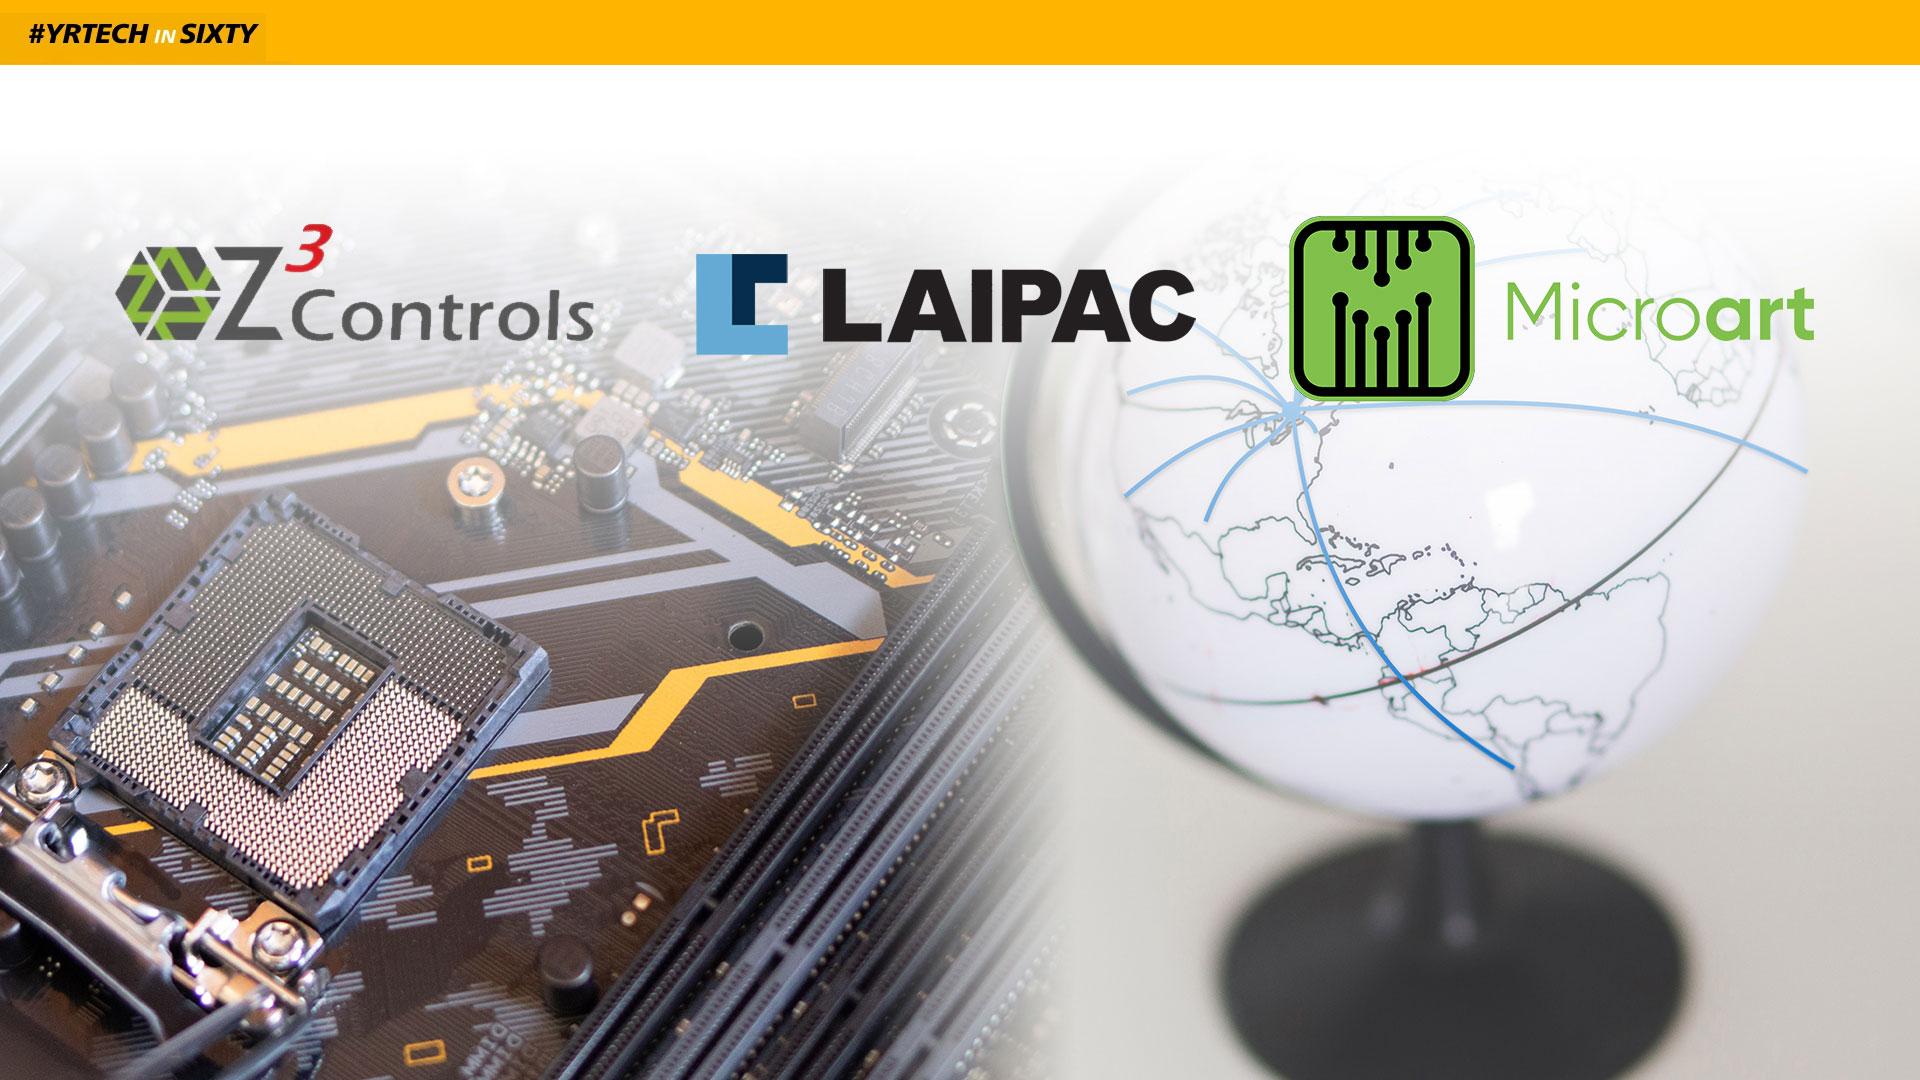 Company Logos, Globe, and Circuit Board